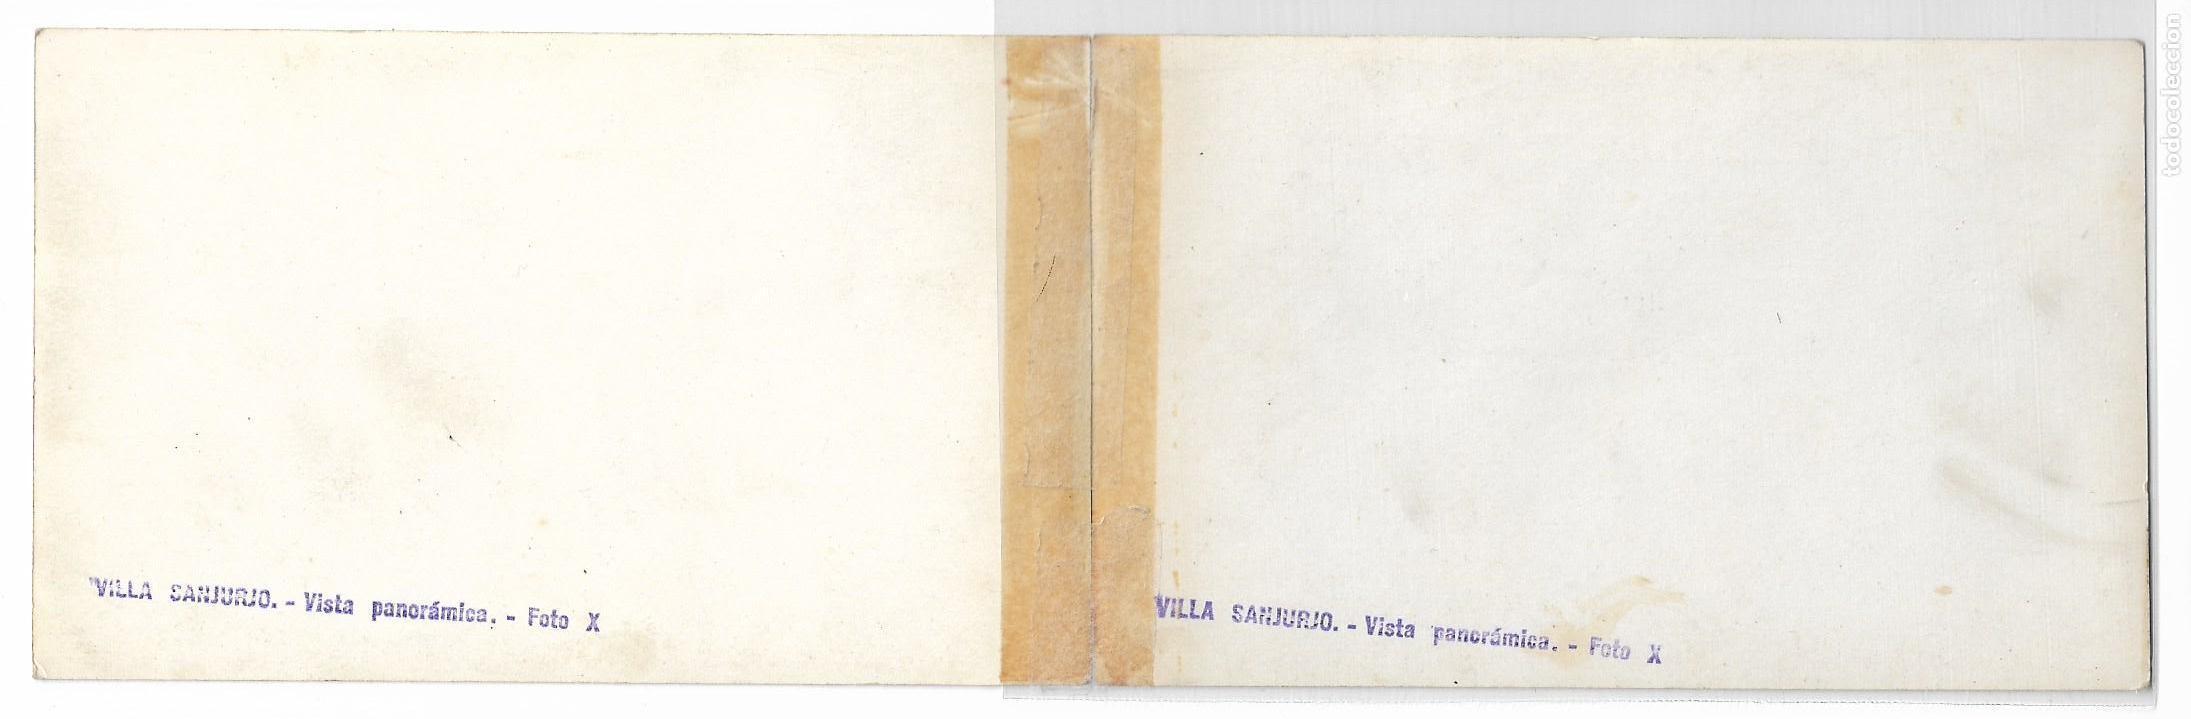 Postales: VILLA SANJURJO - ALHUCEMAS - VISTA PANORÁMICA DOBLE - P28766 - Foto 2 - 158445094